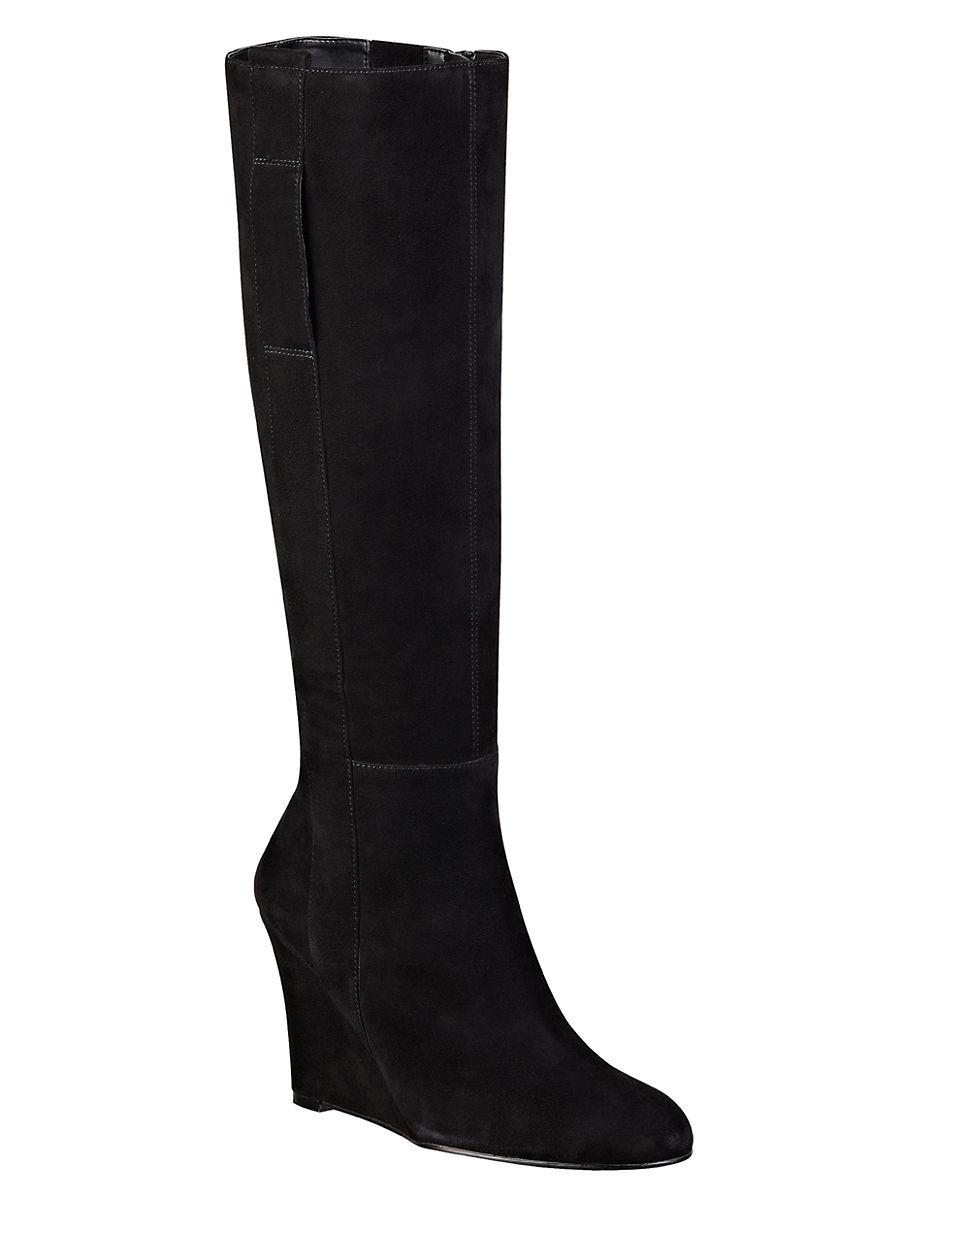 da96a5738320 Lyst - Nine West Oran Suede Wedge Boots in Black